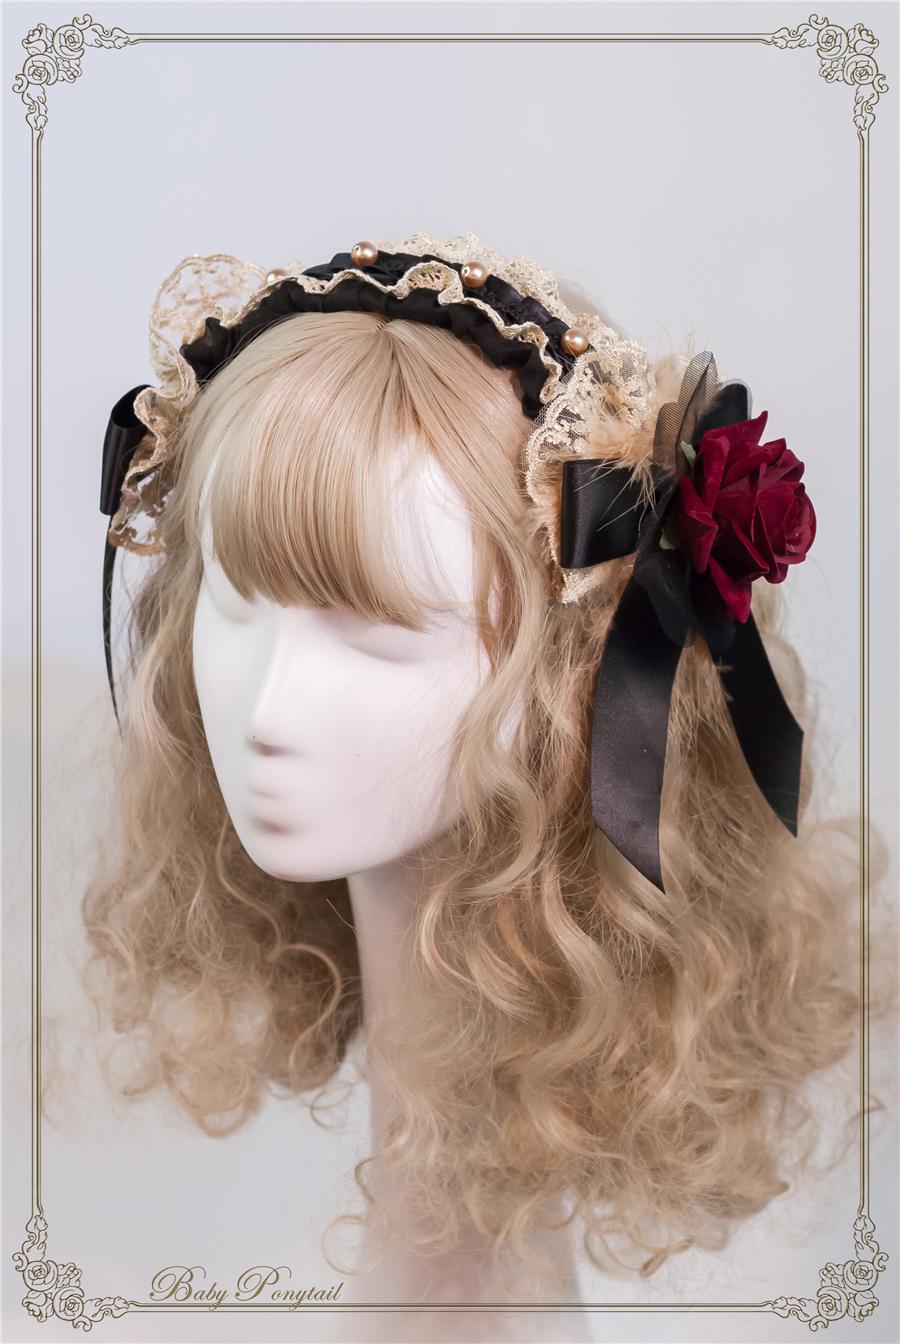 Baby Ponytail_Stock photo_Circus Princess_Rose Head Dress Black_02.jpg